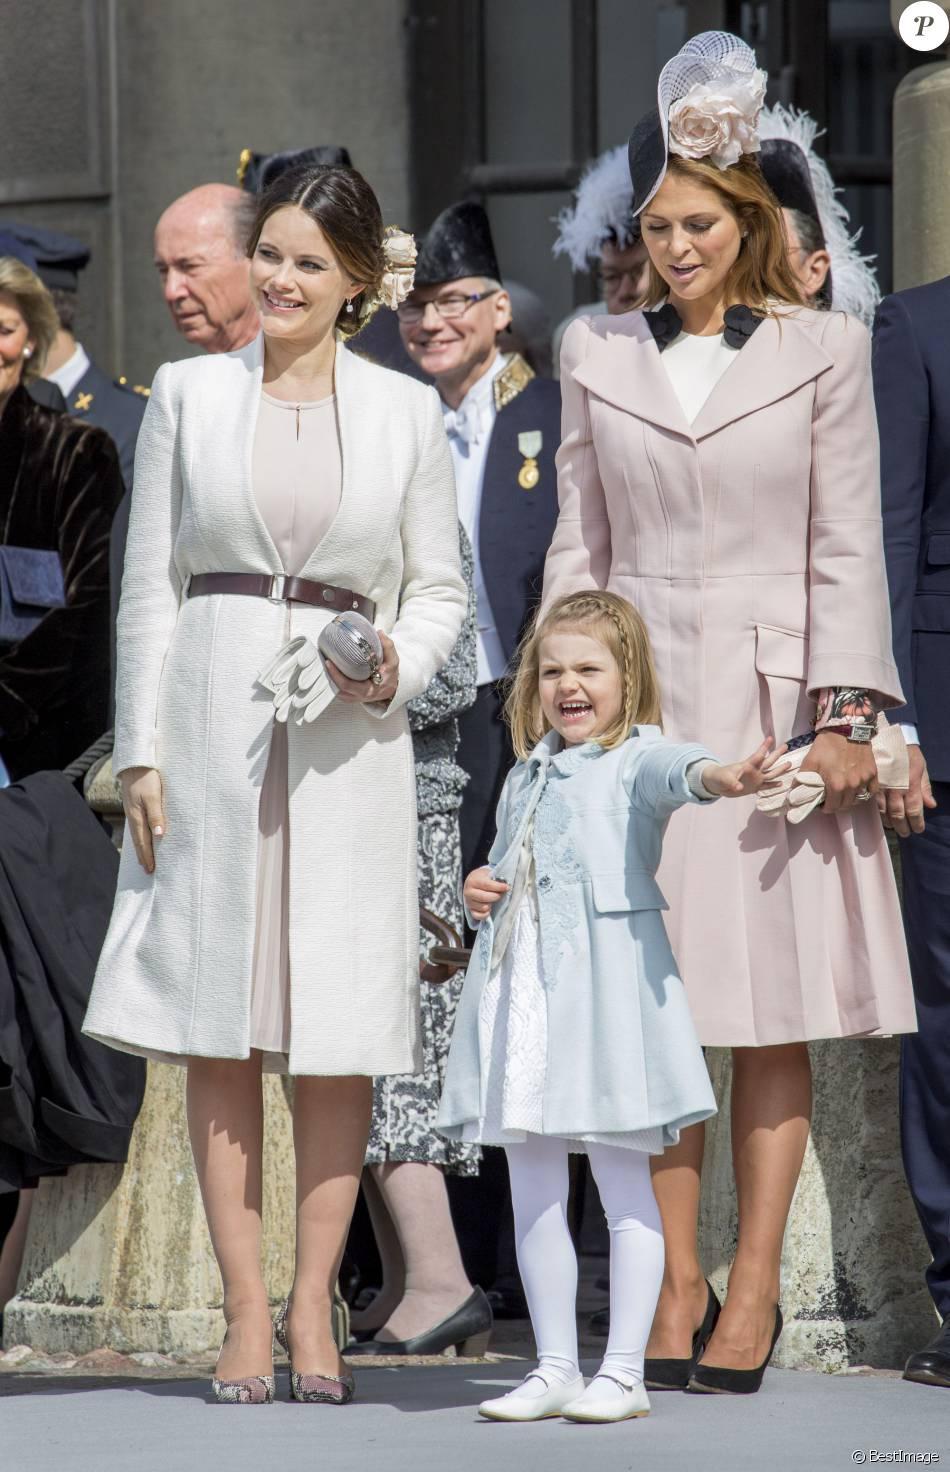 la princesse sofia hellqvist la princesse madeleine et la princesse estelle de su de. Black Bedroom Furniture Sets. Home Design Ideas